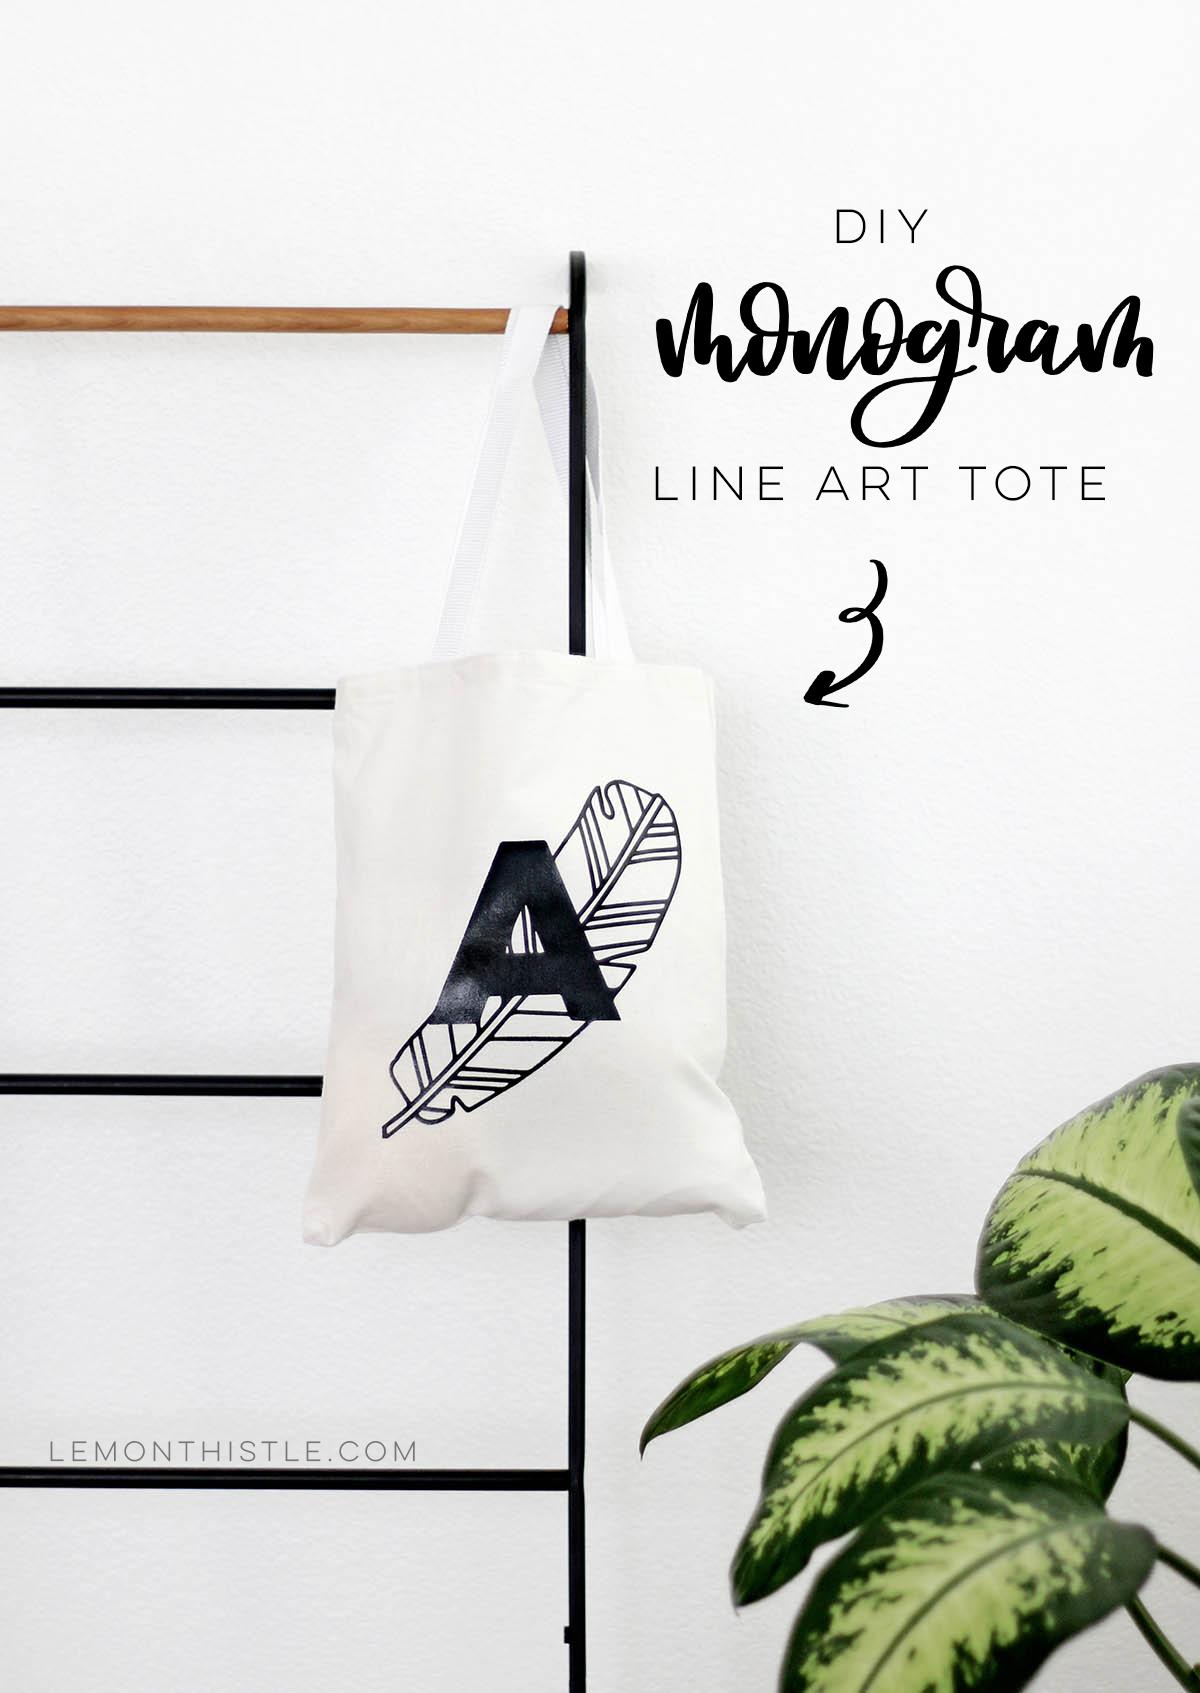 Text overlay: DIY Monogram Line Art Tote Bag